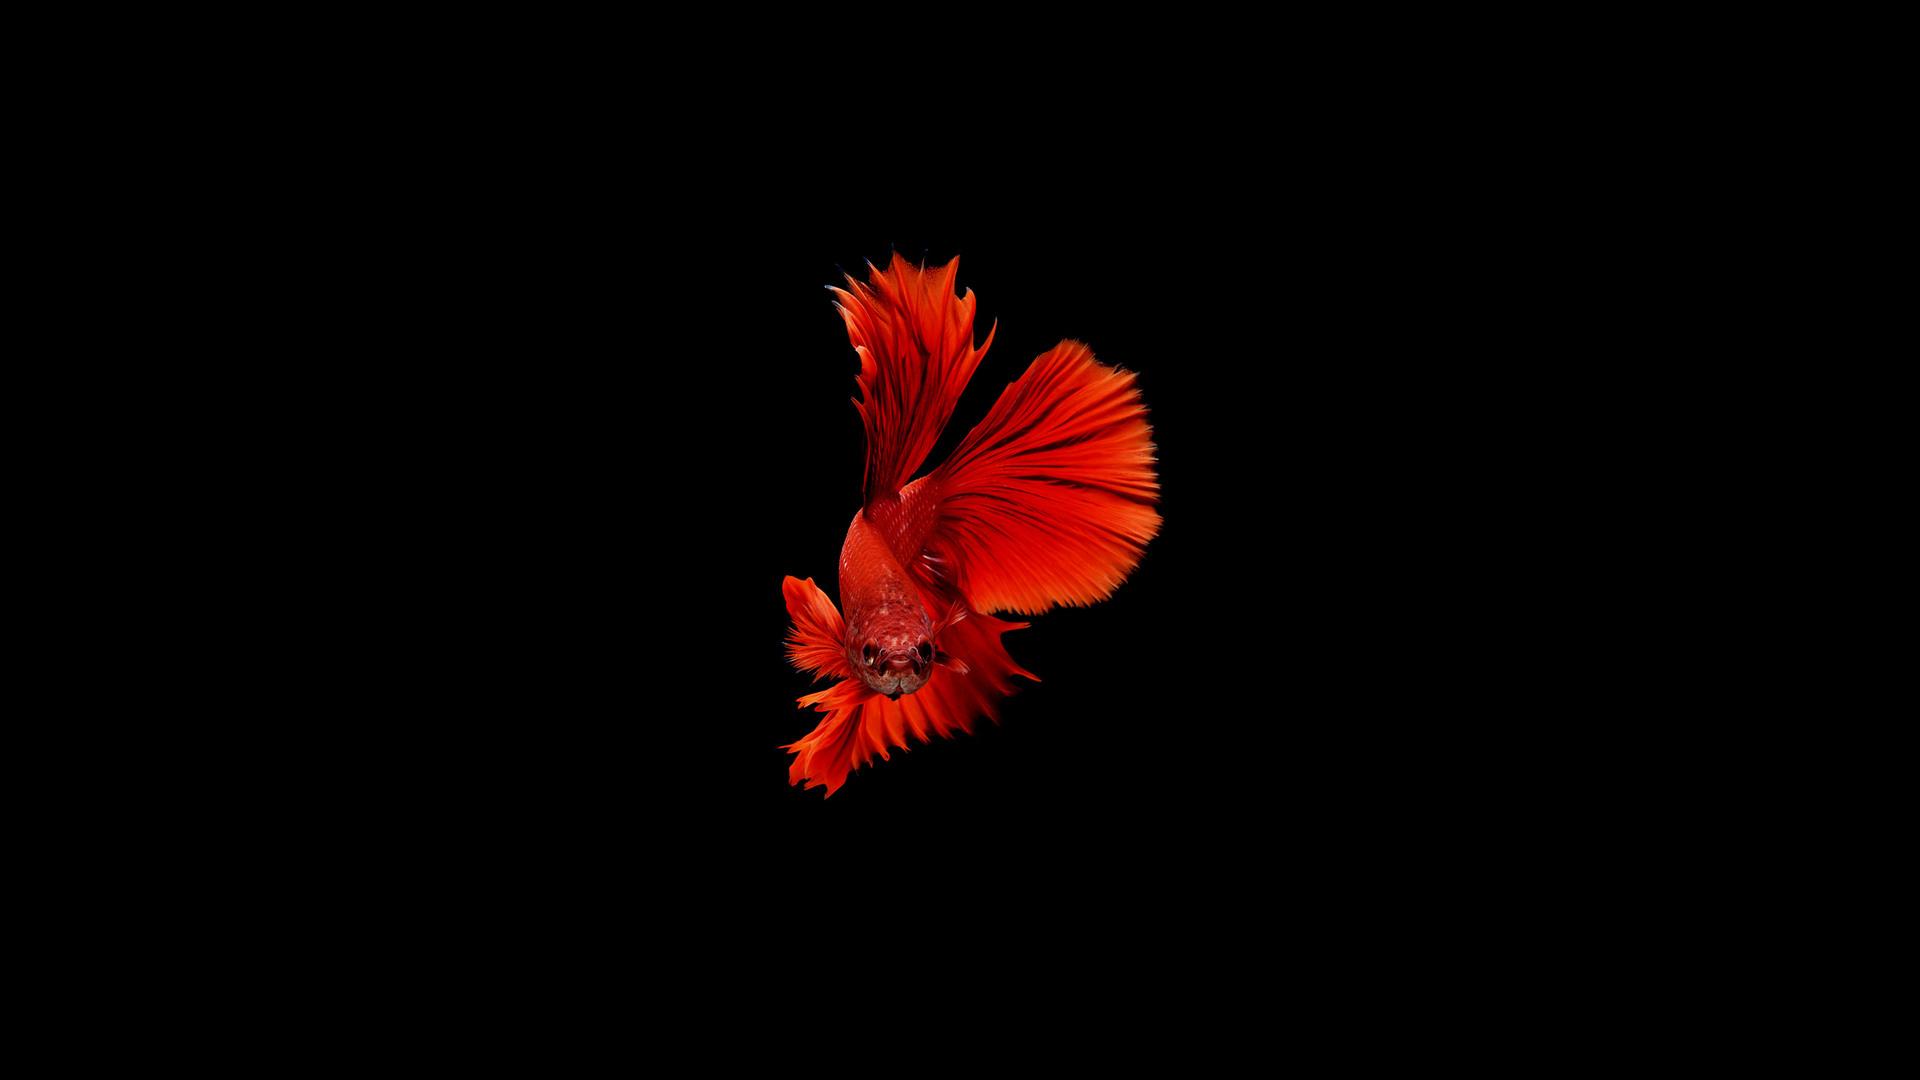 1920x1080 betta fish laptop full hd 1080p hd 4k wallpapers, images